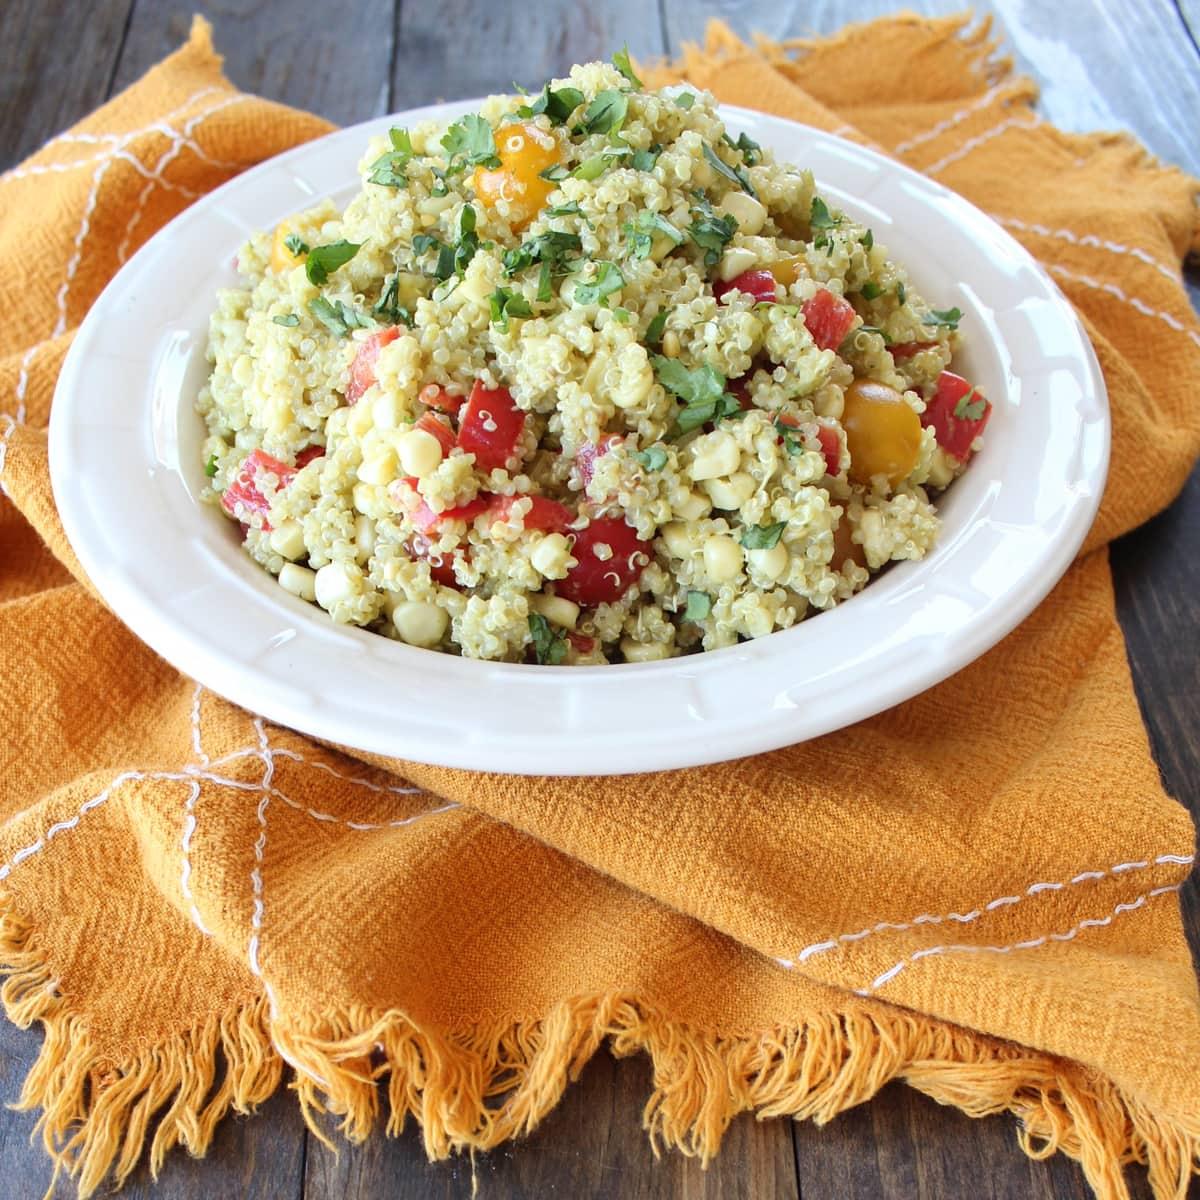 Quinoa Corn Salad with Avocado Dressing